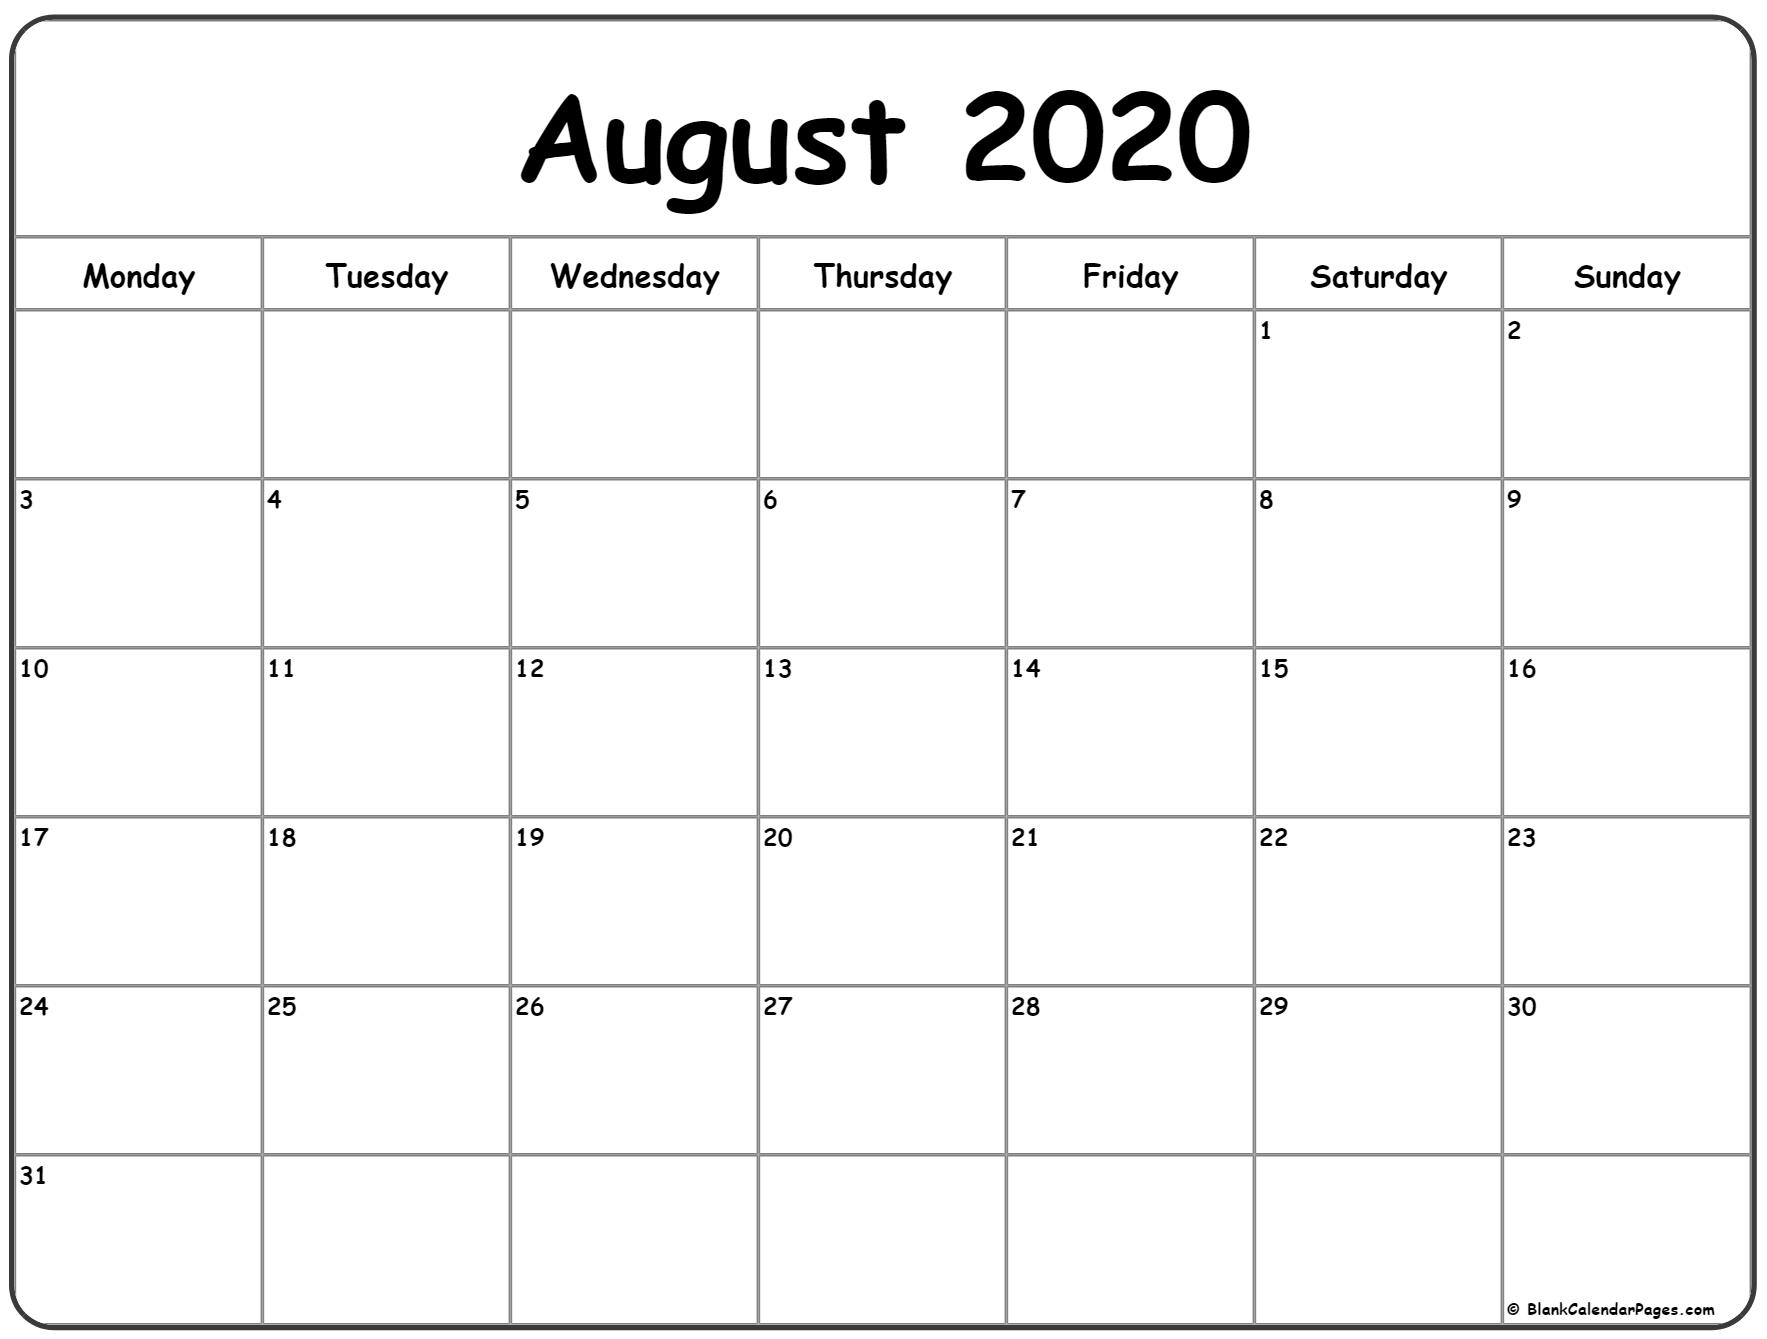 August 2020 Monday Calendar | Monday To Sunday regarding 2020 Calendar That Shows Only Monday Through Friday